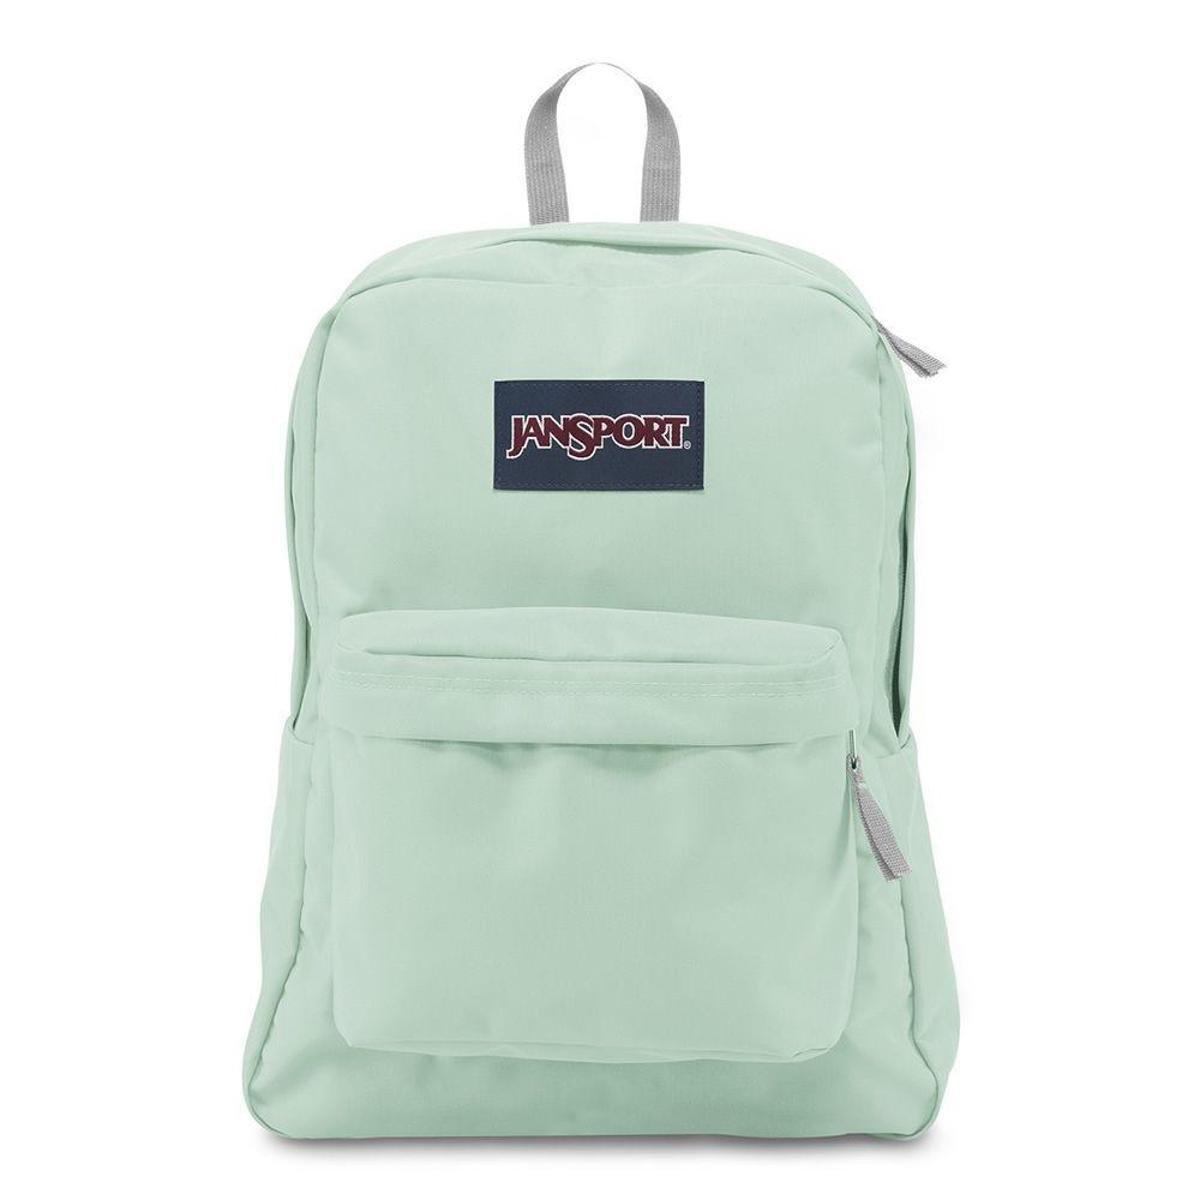 Mochila Jansport Superbreak Brook Green Verde - Compre Agora  88679e8b76b